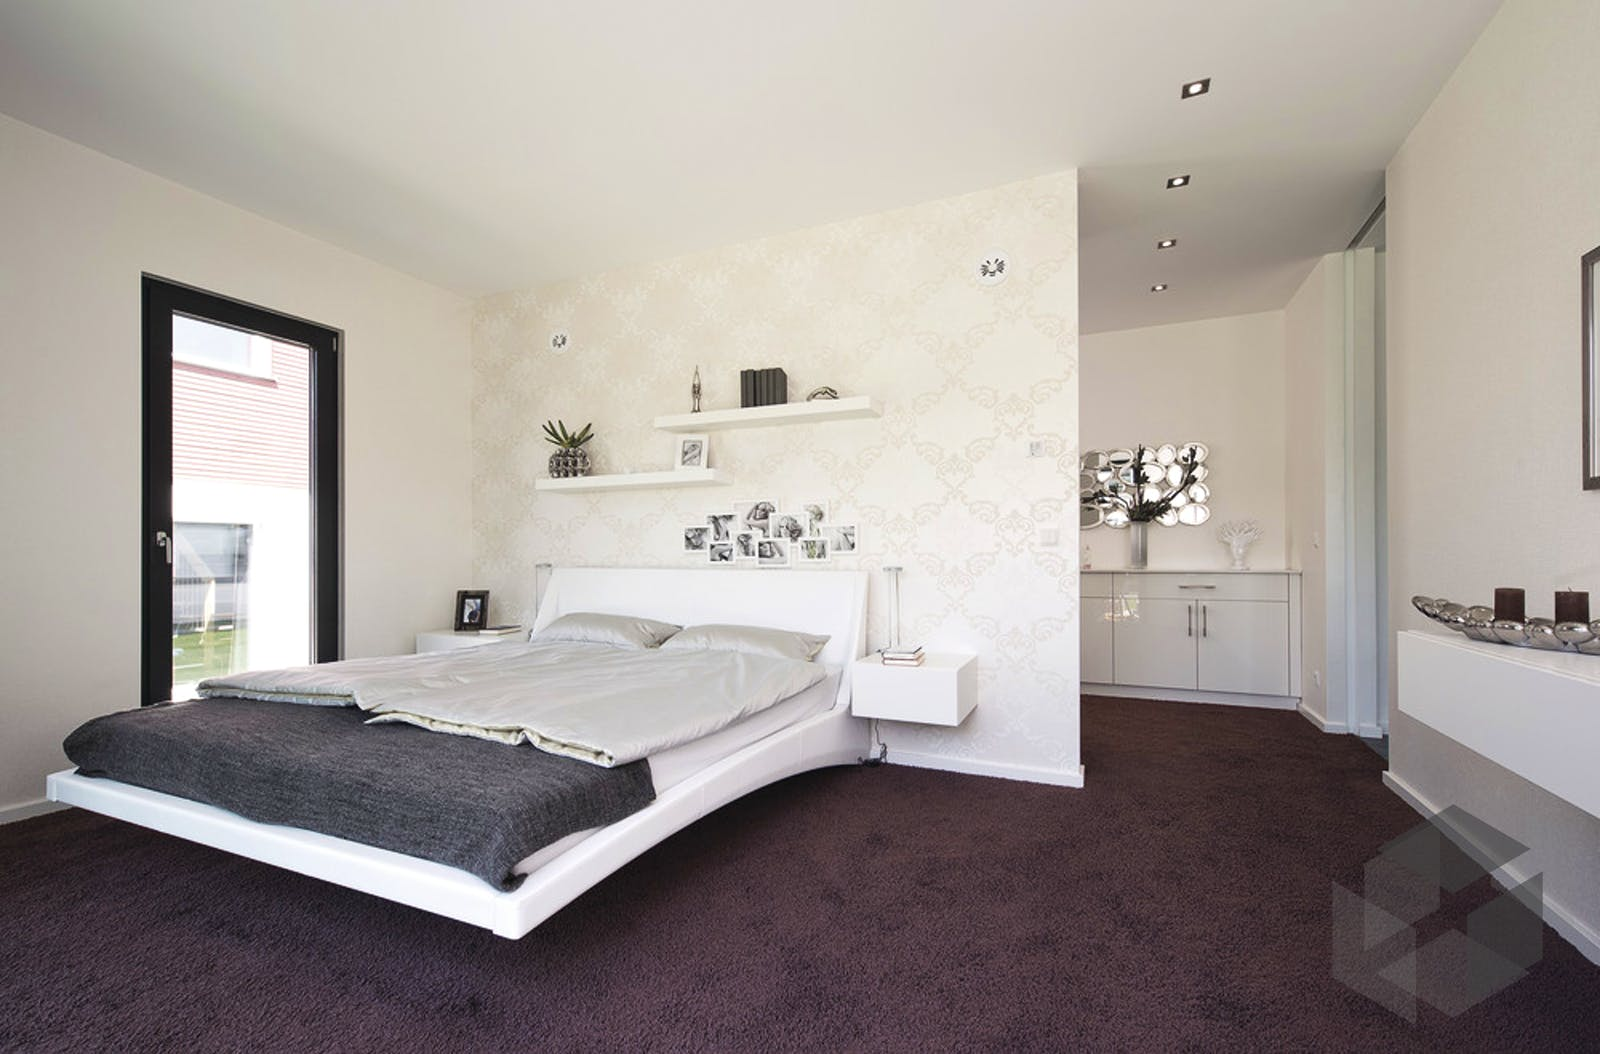 ausstellungshaus mannheim bungalow von weberhaus komplette daten bersicht. Black Bedroom Furniture Sets. Home Design Ideas